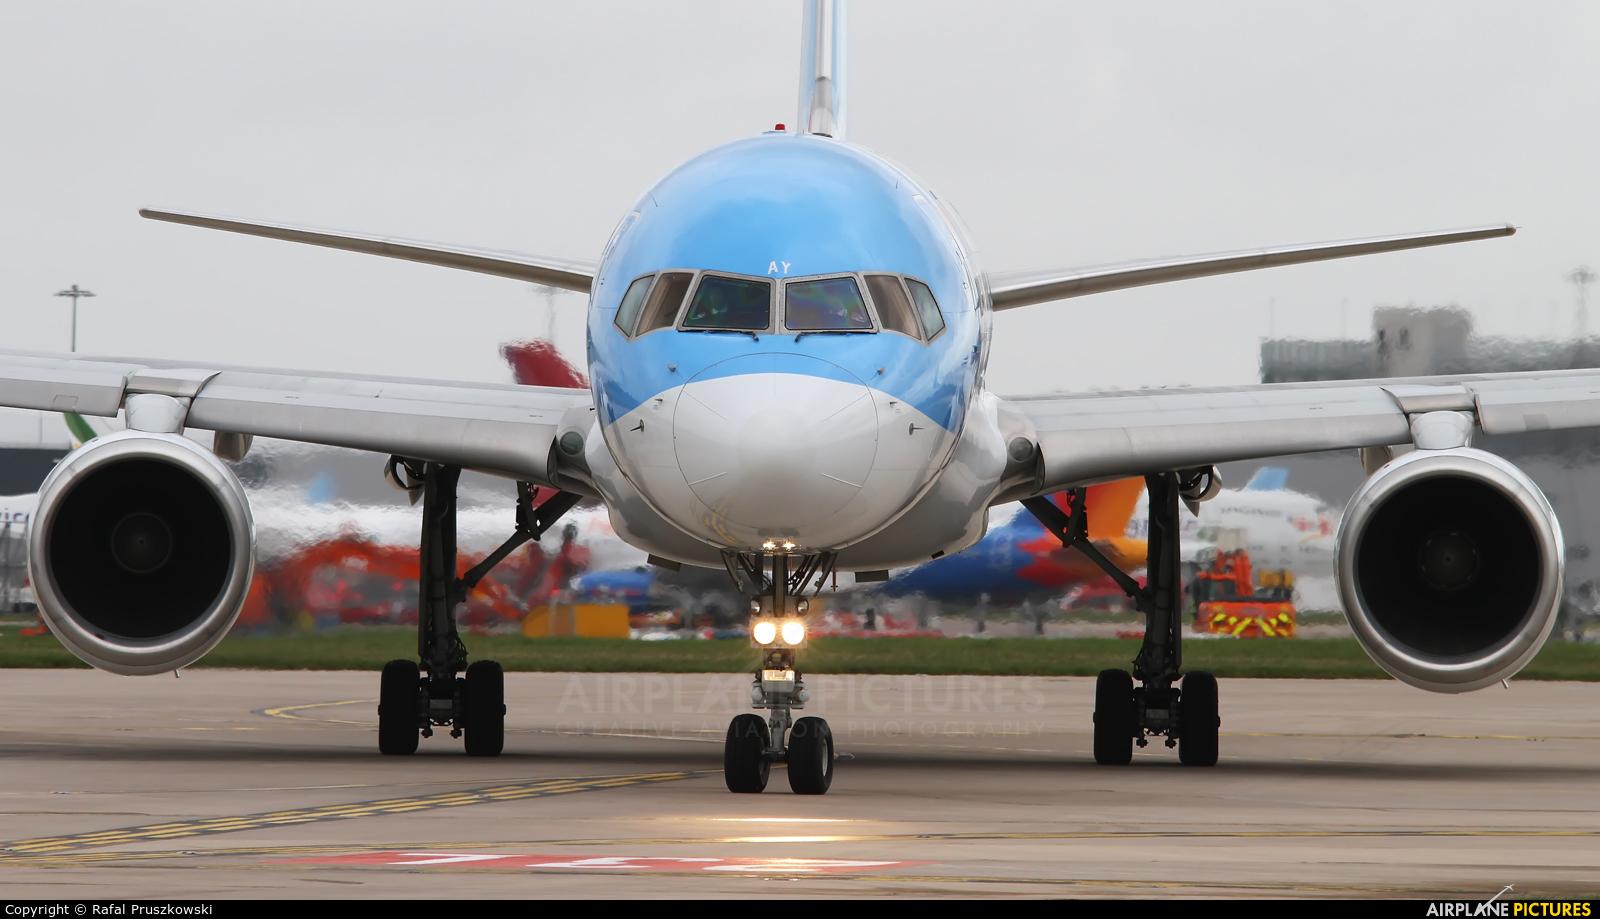 TUI Airways G-BYAY aircraft at Manchester